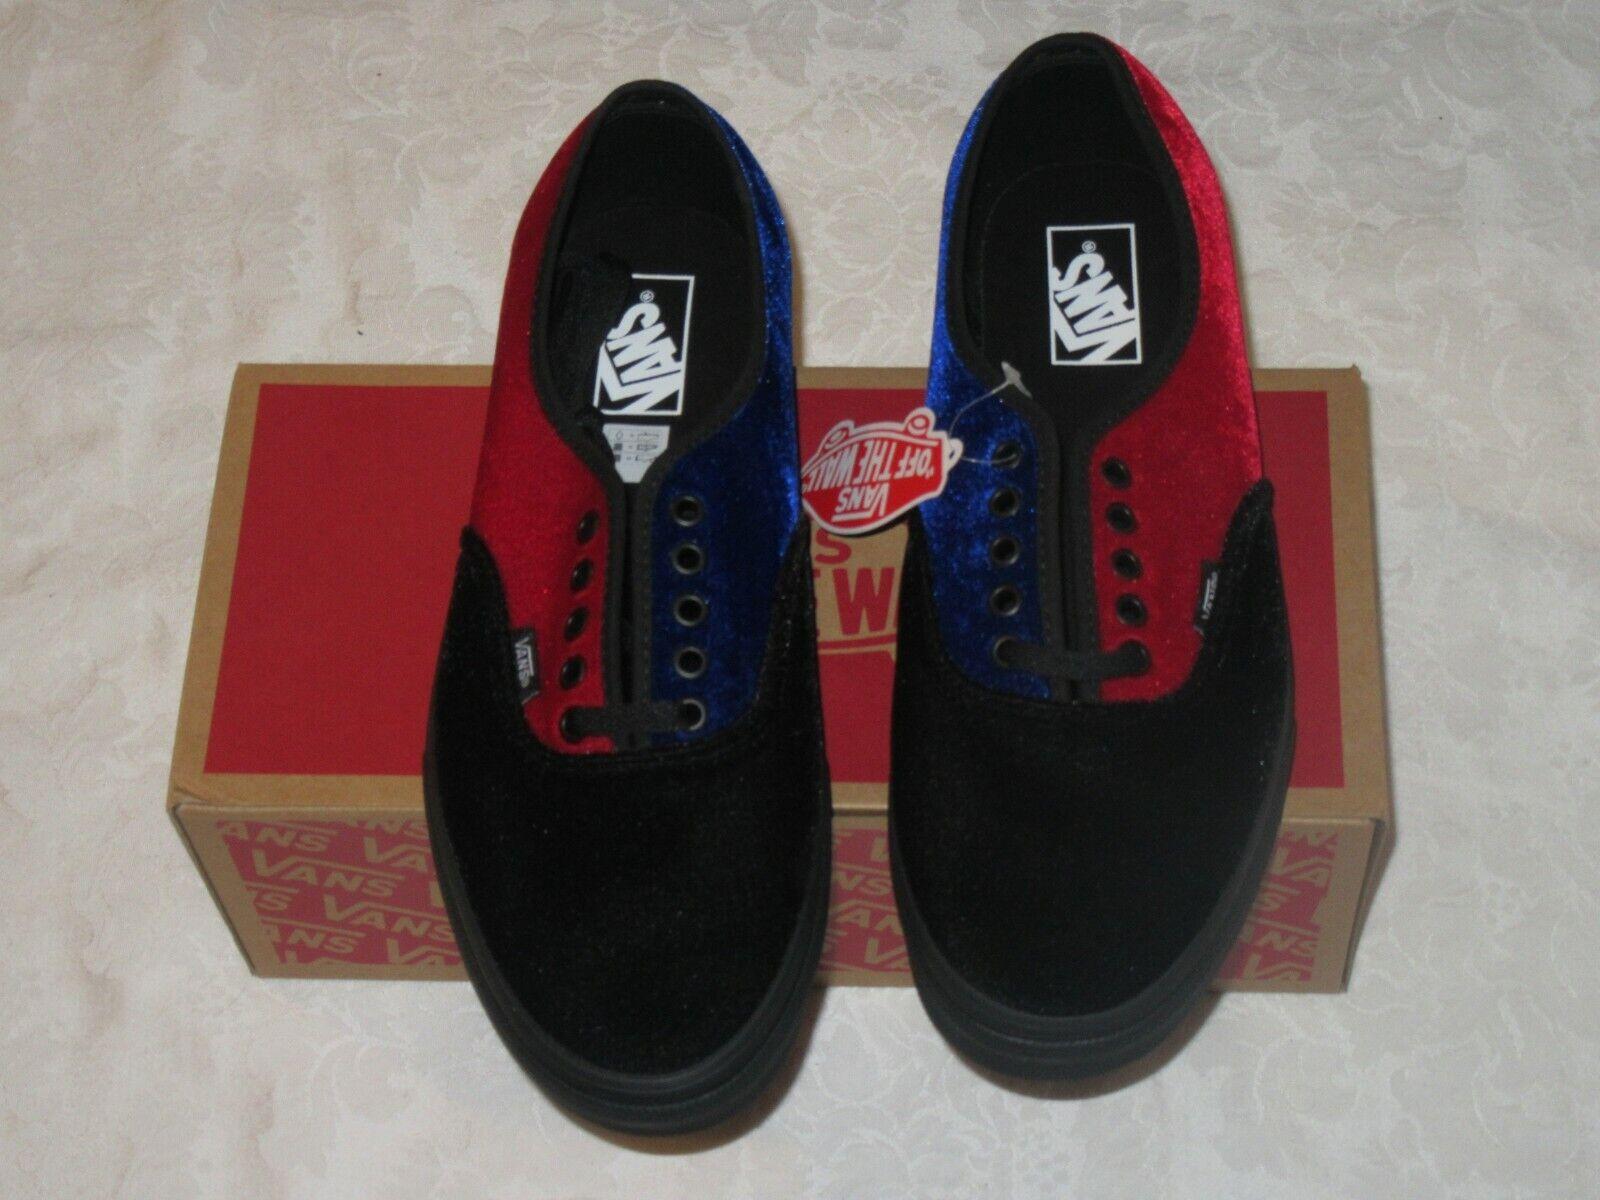 Vans Authentic Velvet Tri Tone VN0A38EMRYV Black bluee Red Exclusive Men US 10.5